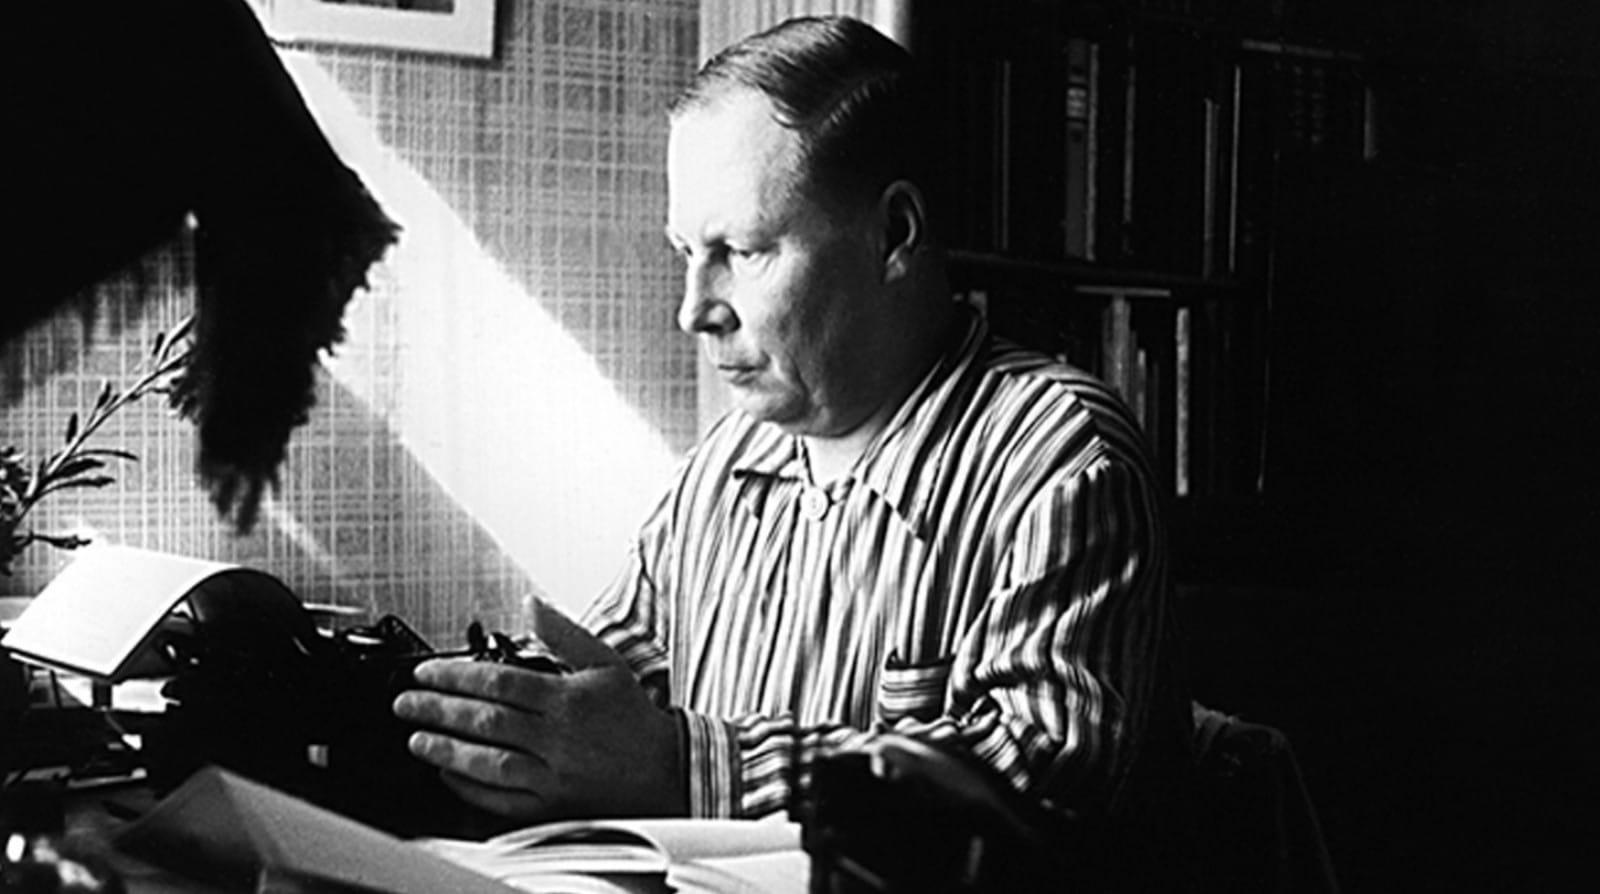 MAY 7 - BIRTHDAY OF NIKOLAS ZABOLOTSKY - RUSSIAN SOVIET POET AND TRANSLATOR